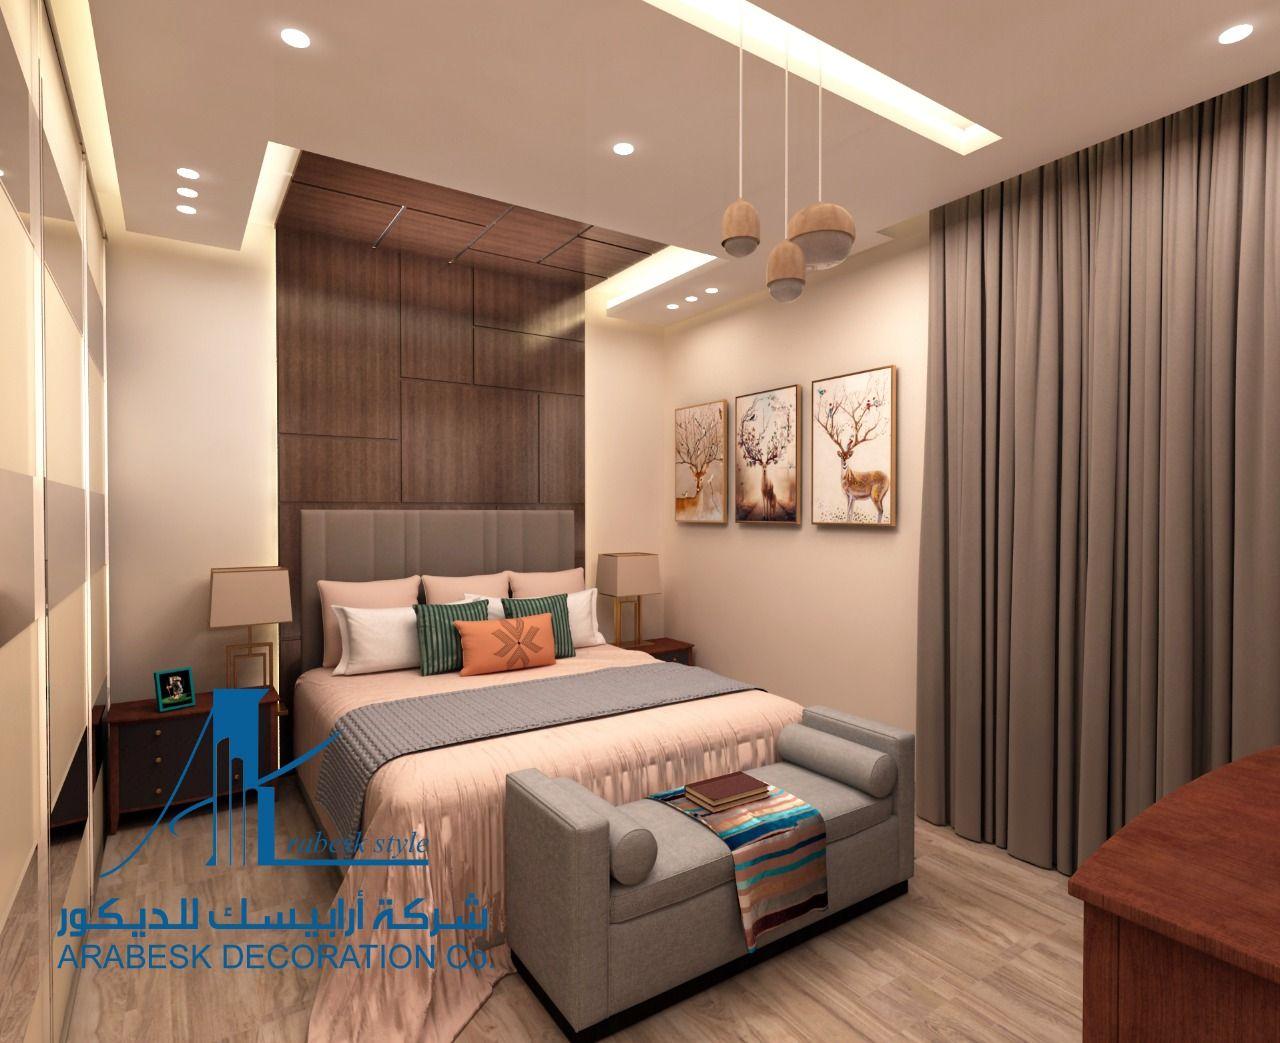 ديكورات جبس مودرن 2019 بورد غرف نوم مجالس صالونات مشروع طبر بور Room Furniture Home Decor